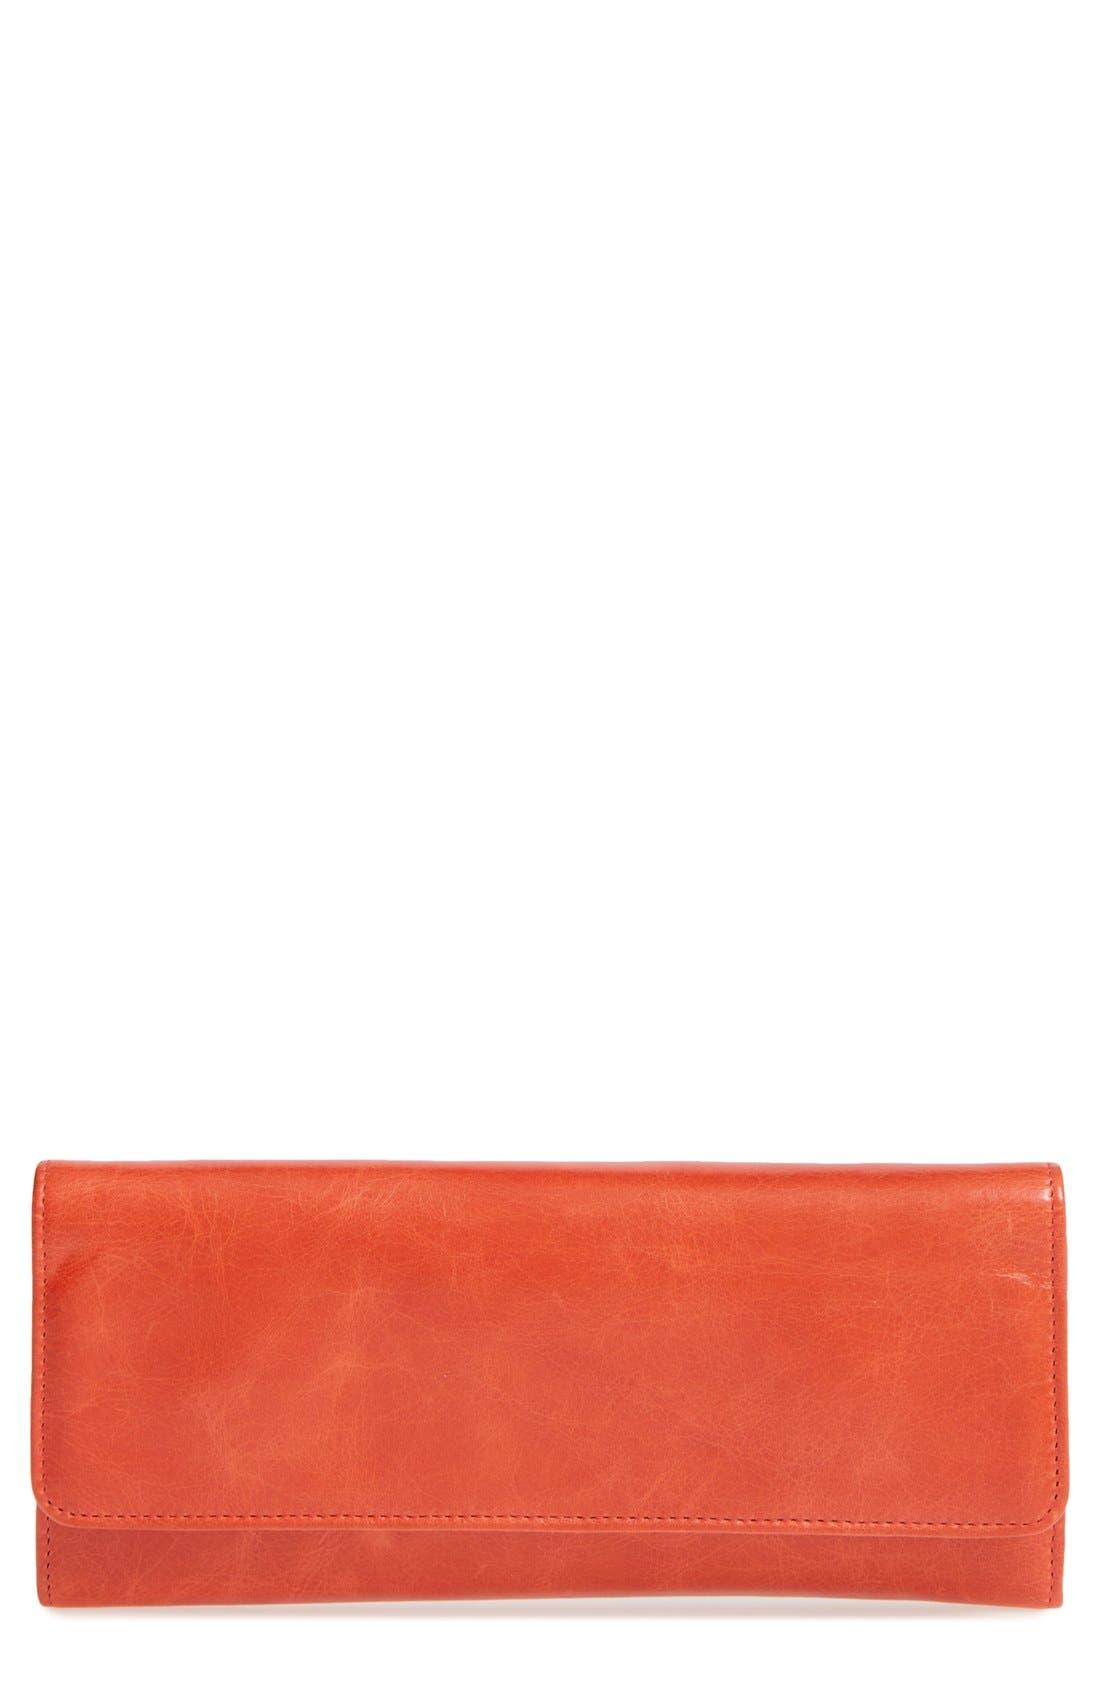 'Sadie' Leather Wallet,                             Main thumbnail 59, color,